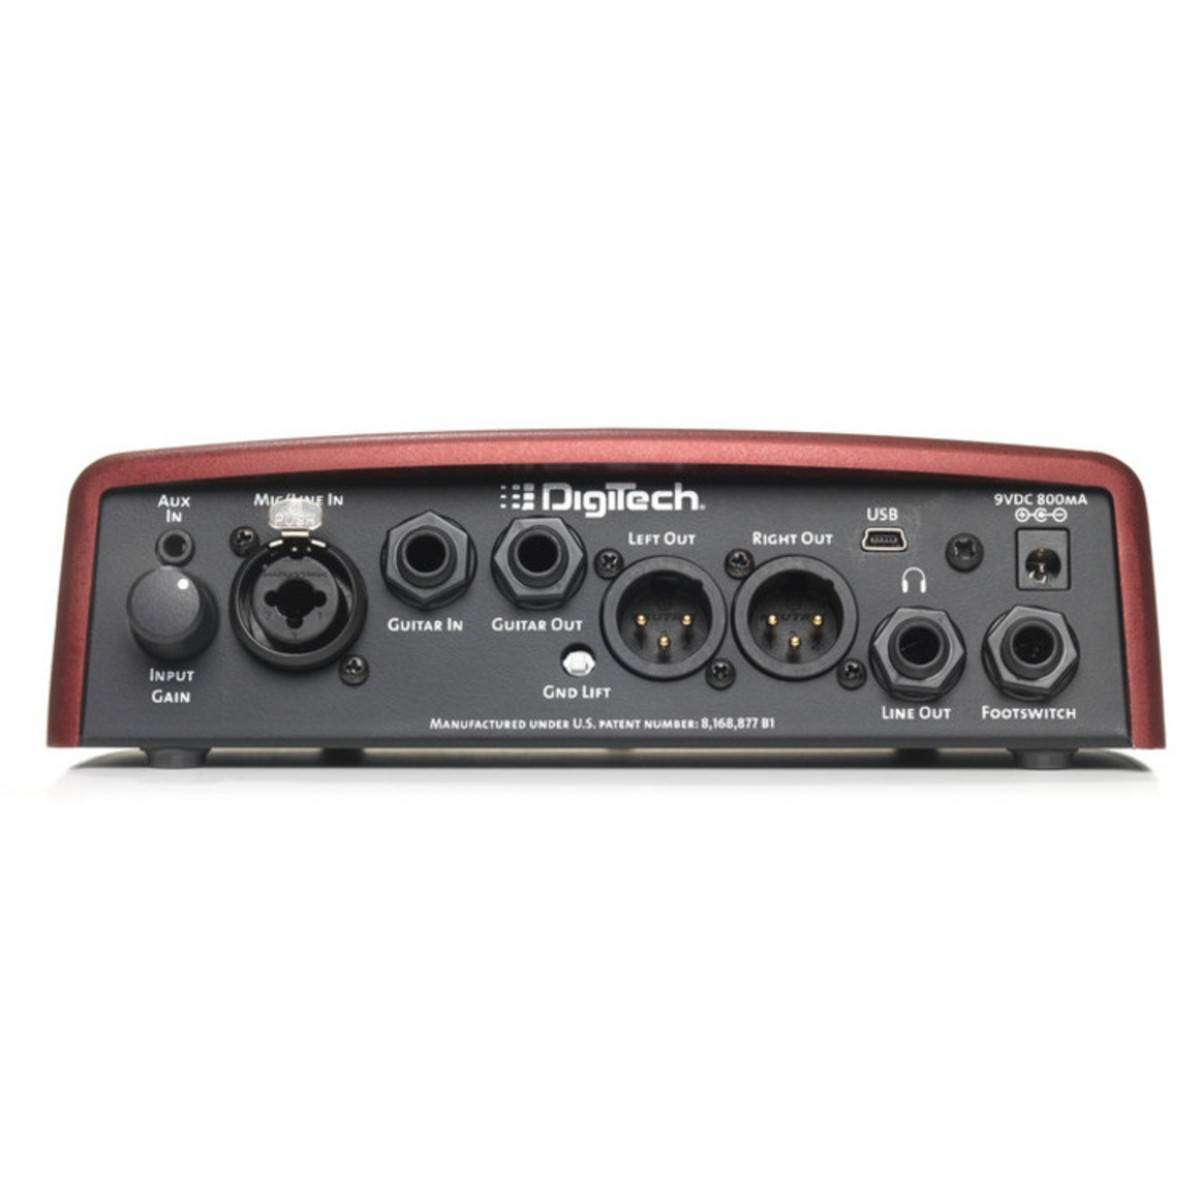 disc digitech live harmony vocal processor at gear4music. Black Bedroom Furniture Sets. Home Design Ideas